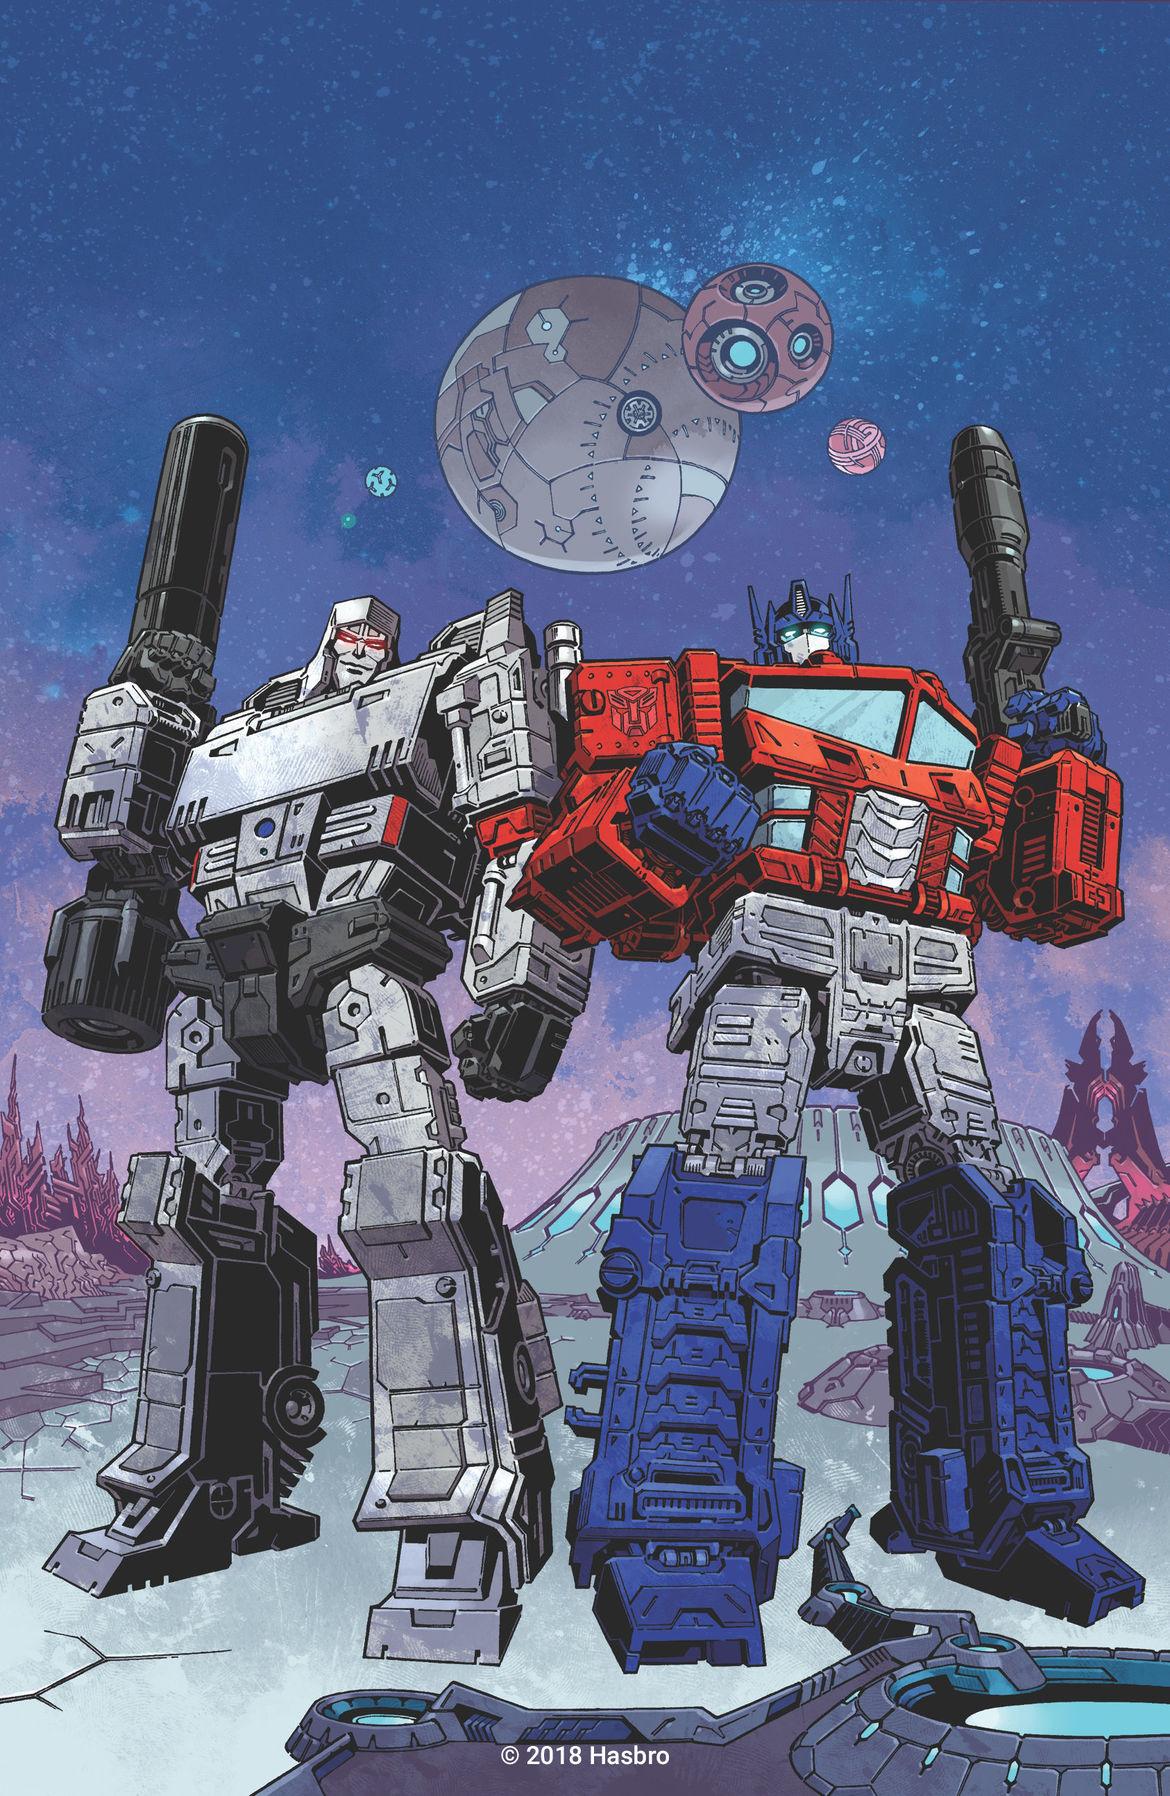 TransformersGabriel RodriguezVariant